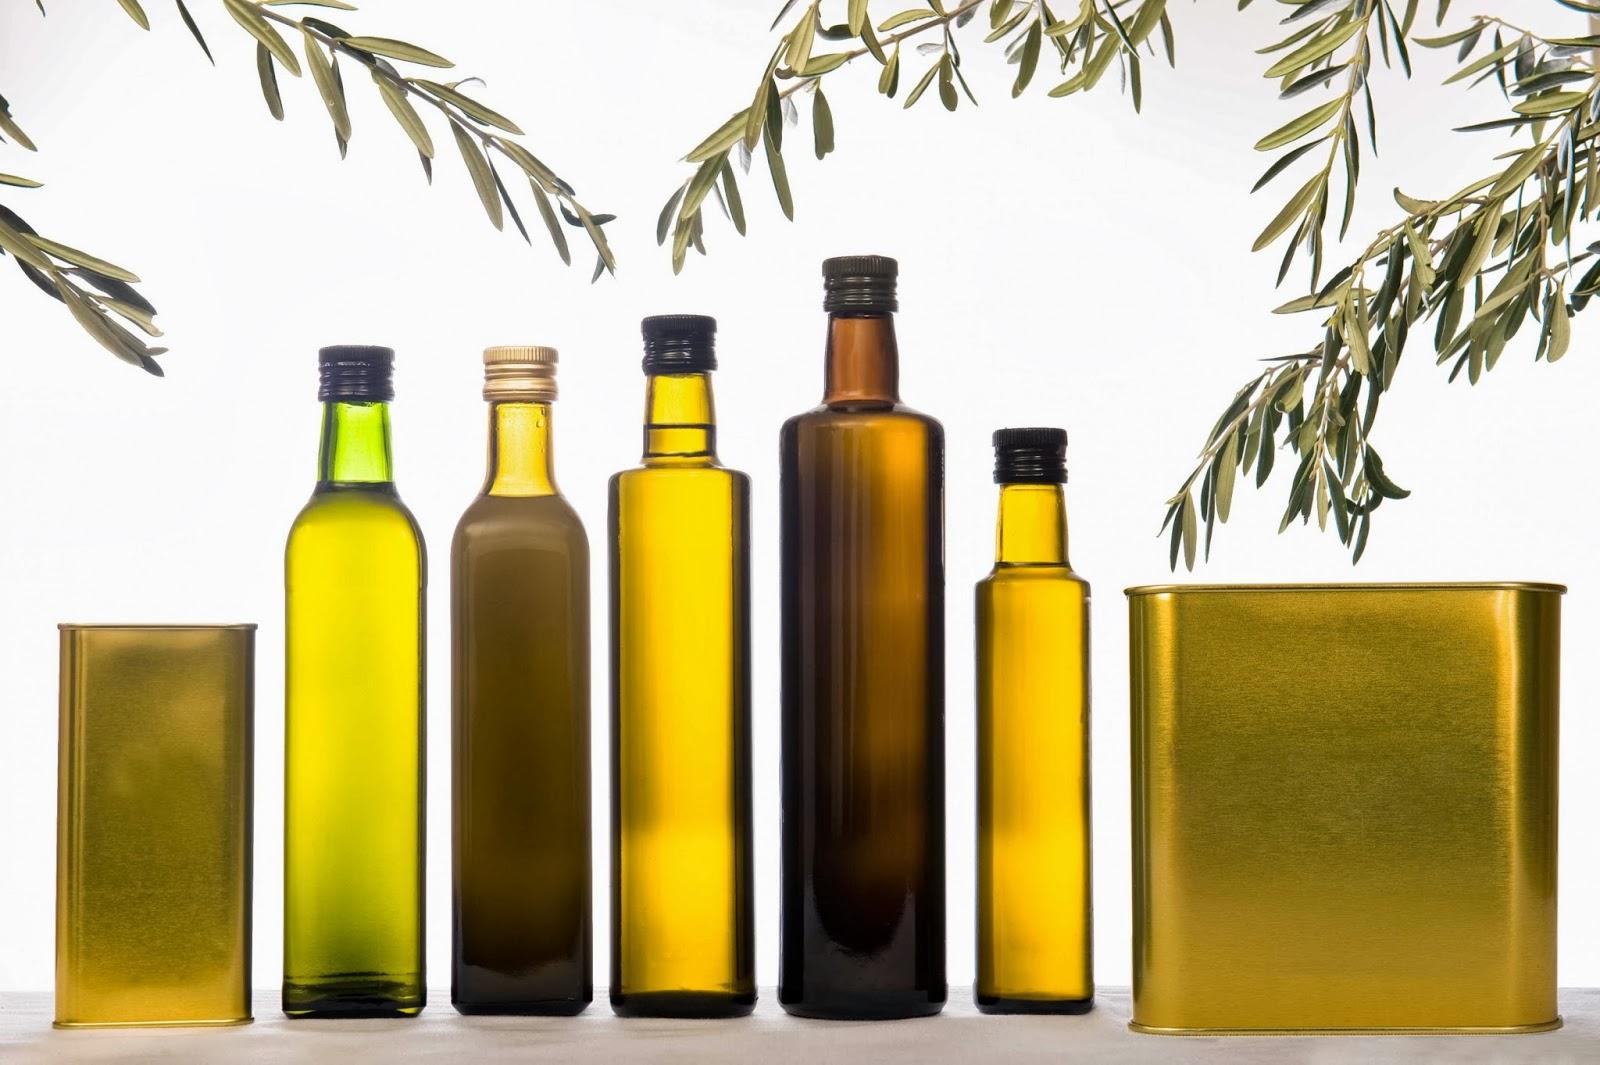 embotellar-aceite-oliva-virgen-extra